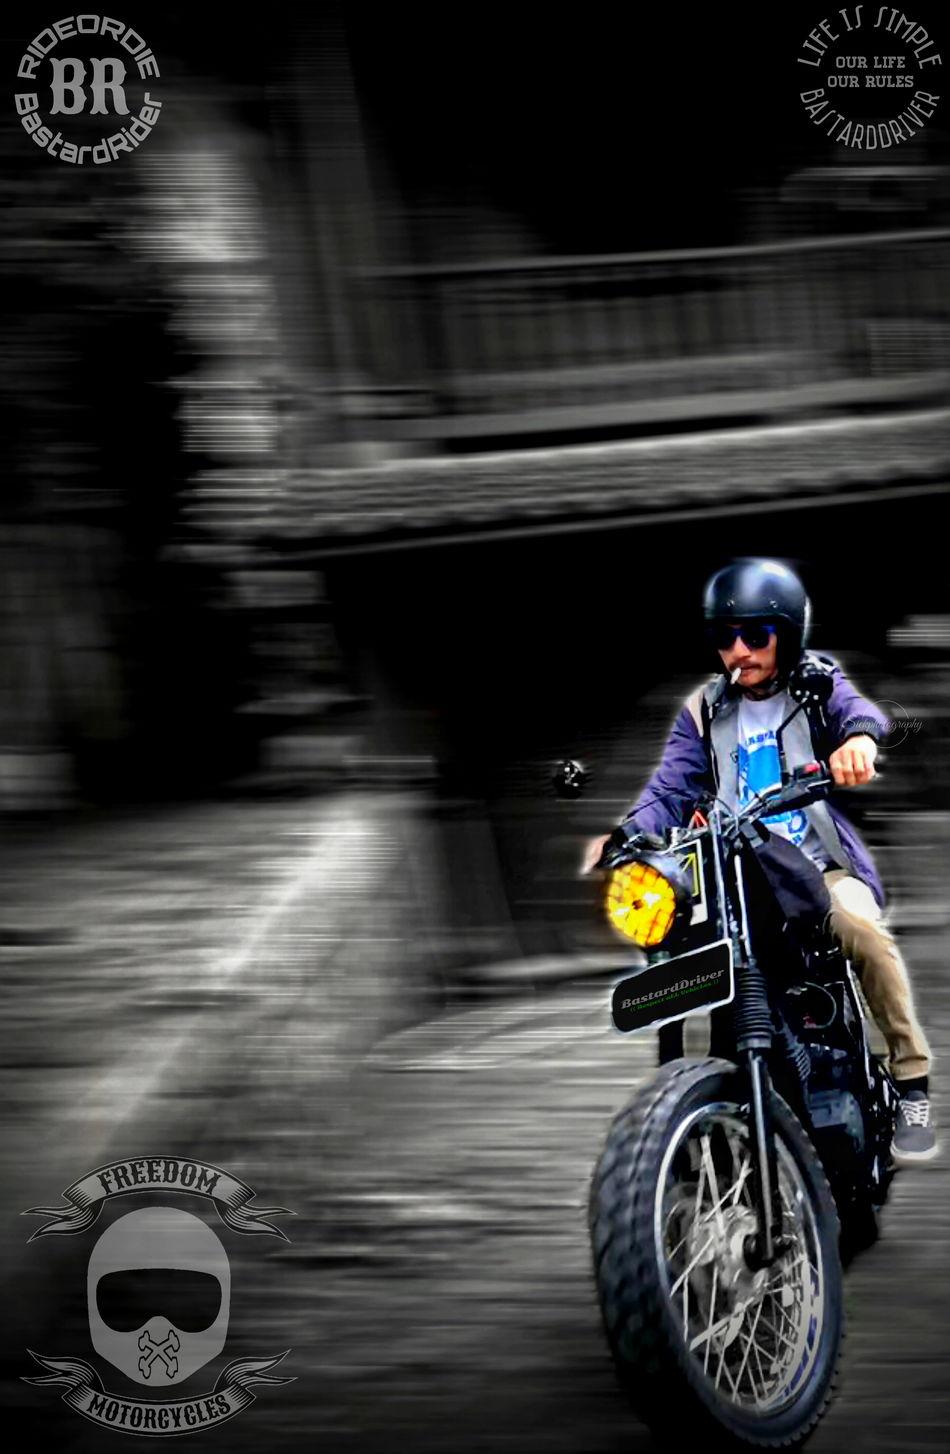 Freedommotorcycles Mymagicfingers Mymotorcyles Mytoyz Sickphotography Fuckyourtripfuckyouradventure MyLifeMyRules INDONESIA Custom Bikes Scrambleryamaha Yamaha Hello World Ride Or Die Bastarddriver Bastardrider Respectallvehicles